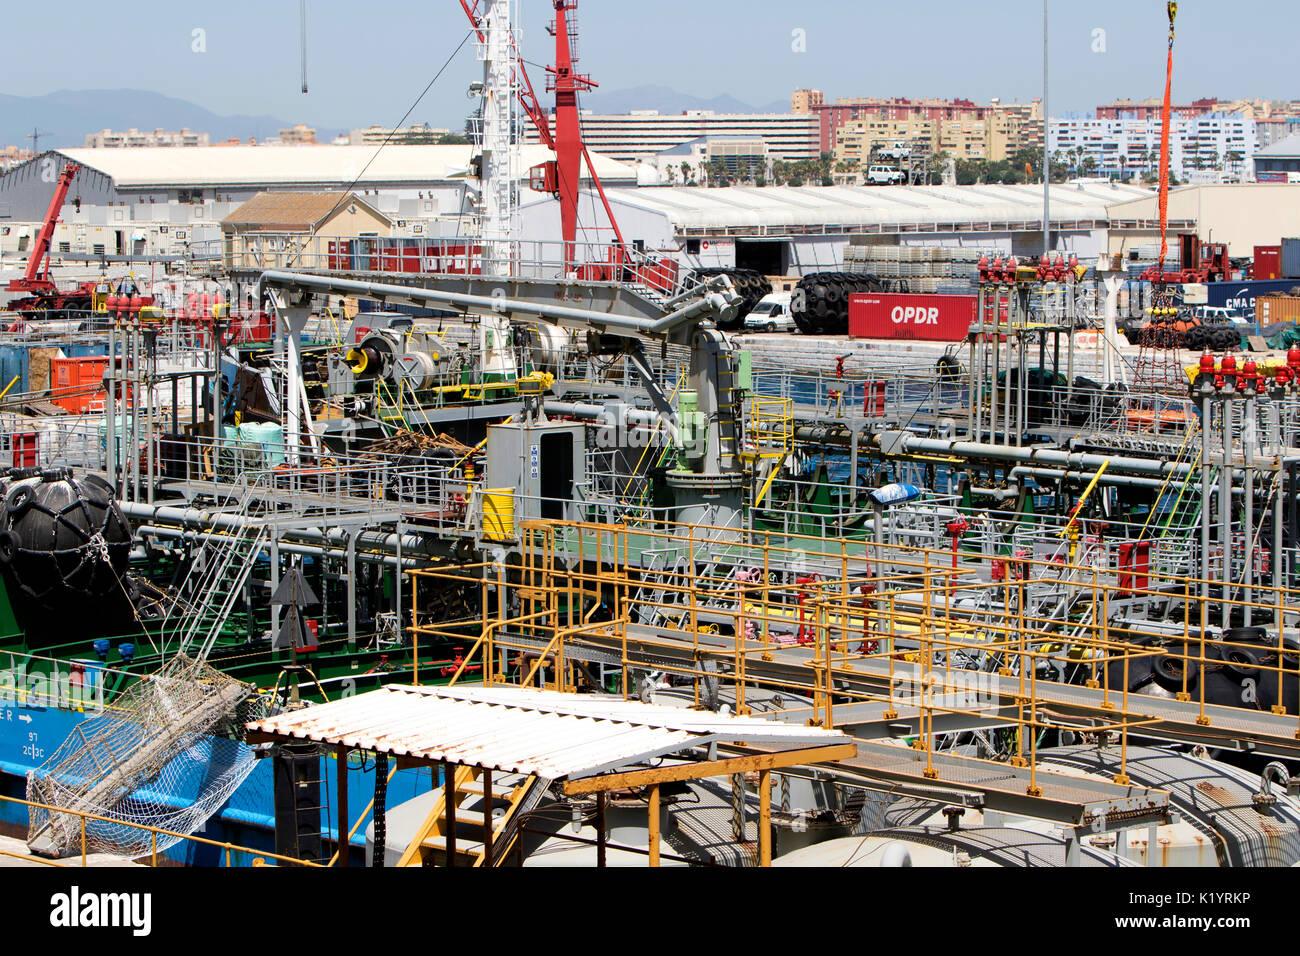 Kassos Monrovia IMO 9382164 Oil tanker berthed in Gibraltar - Stock Image